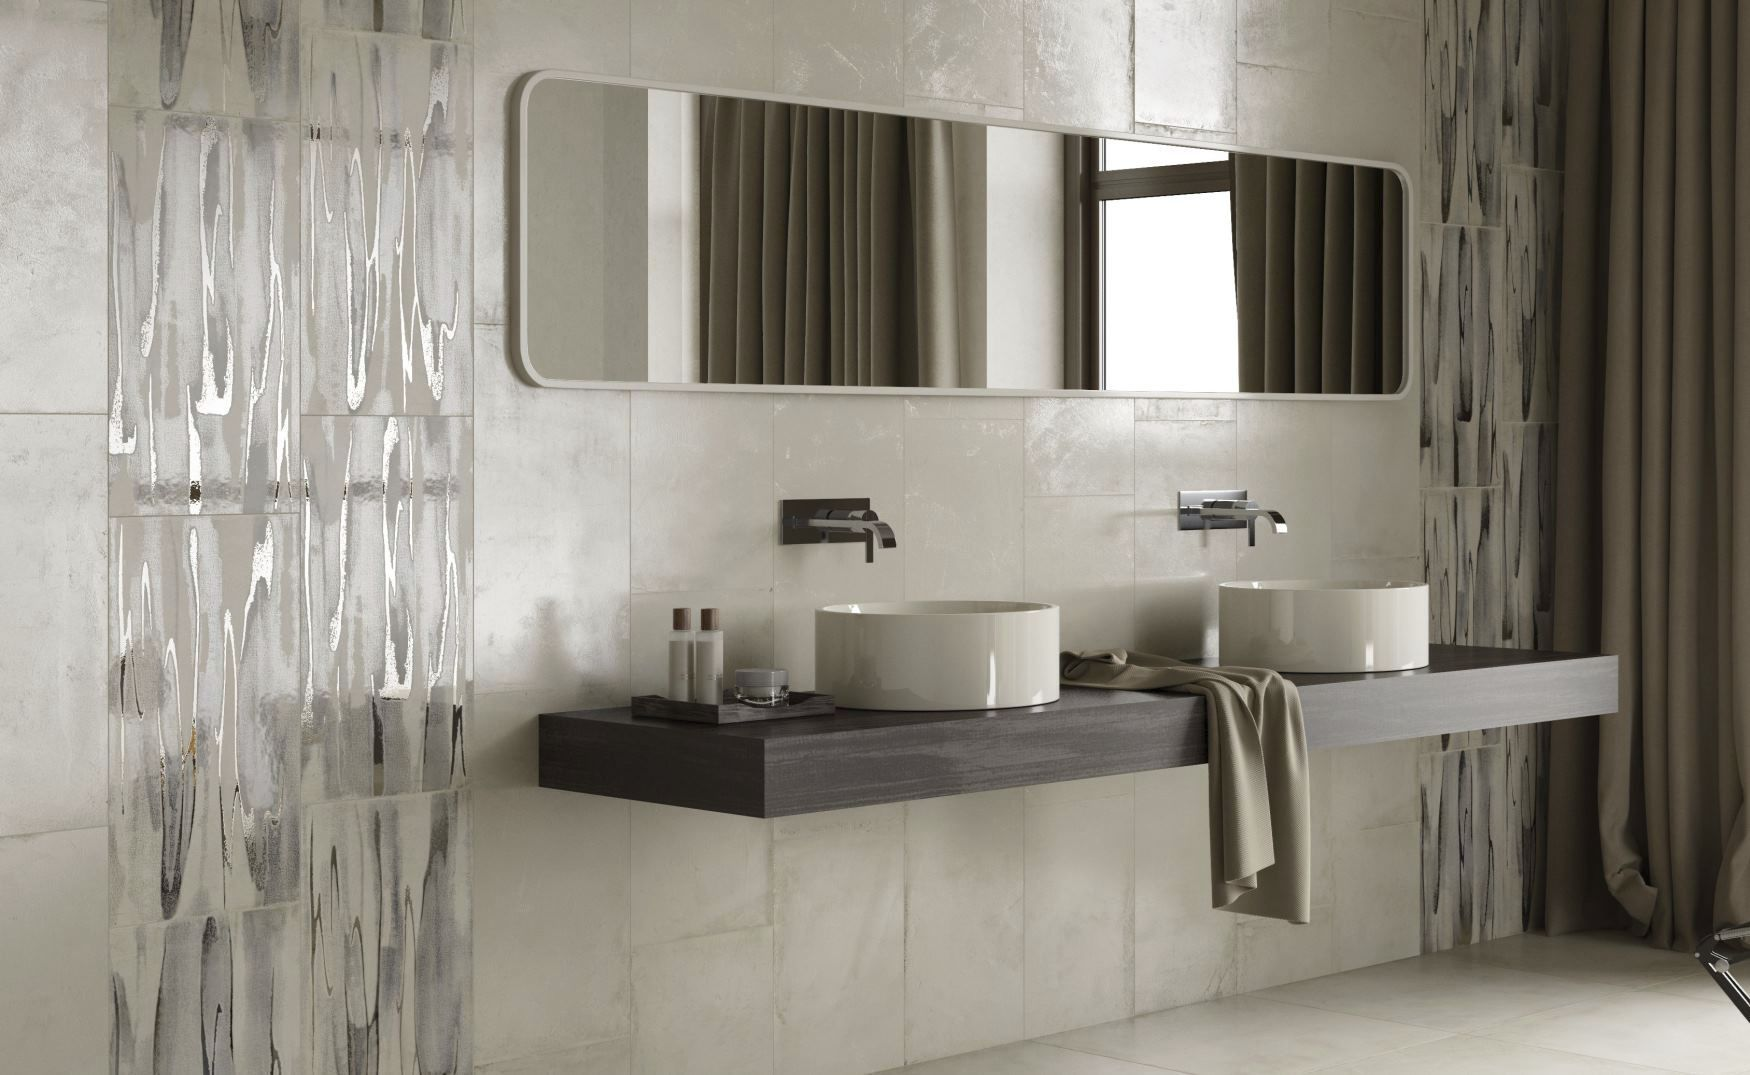 How to cover wall tiles -  Bathroom Tile Kitchen Floor Wall Res Cover Decoro Ceramiche Ricchetti